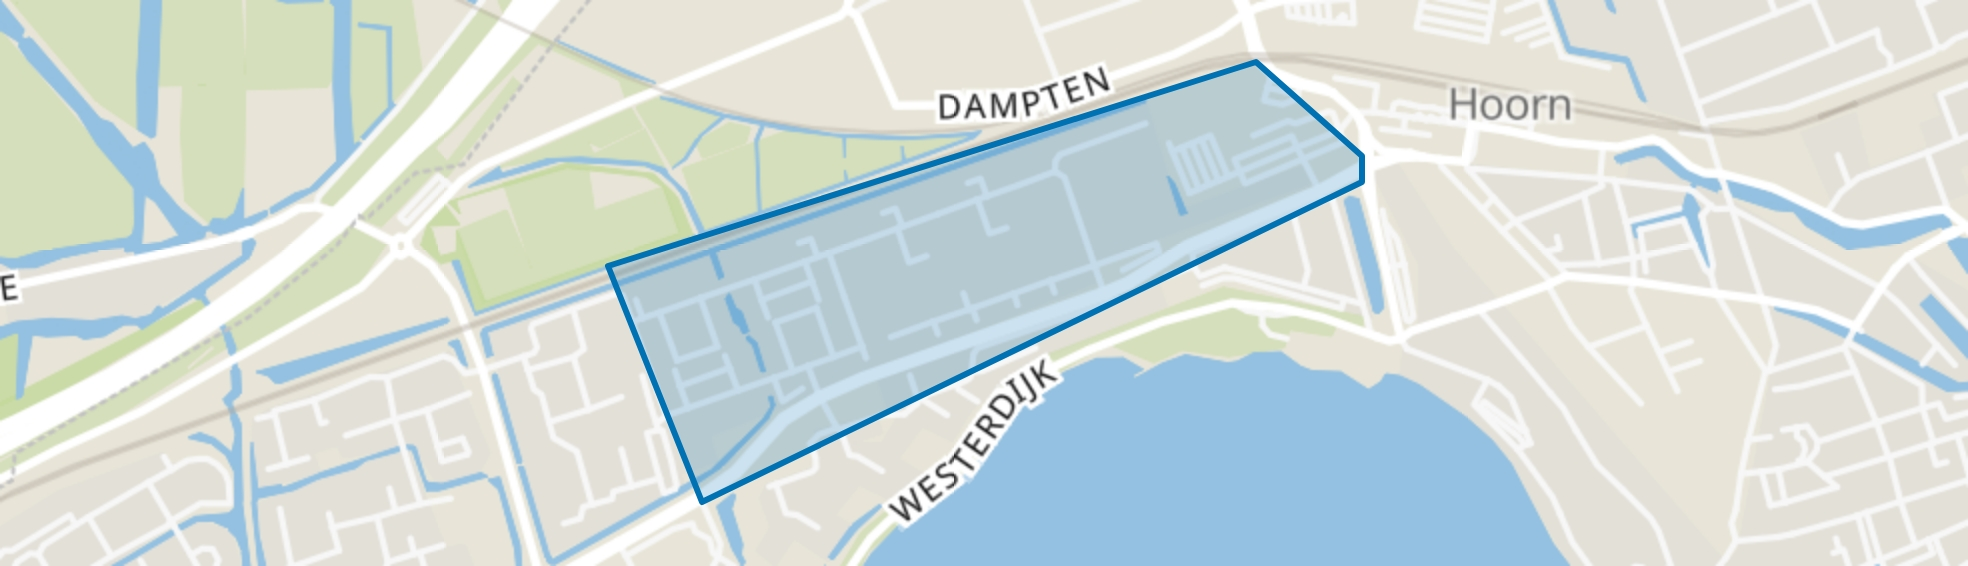 Grote Waal - Buurt 13 01, Hoorn (NH) map